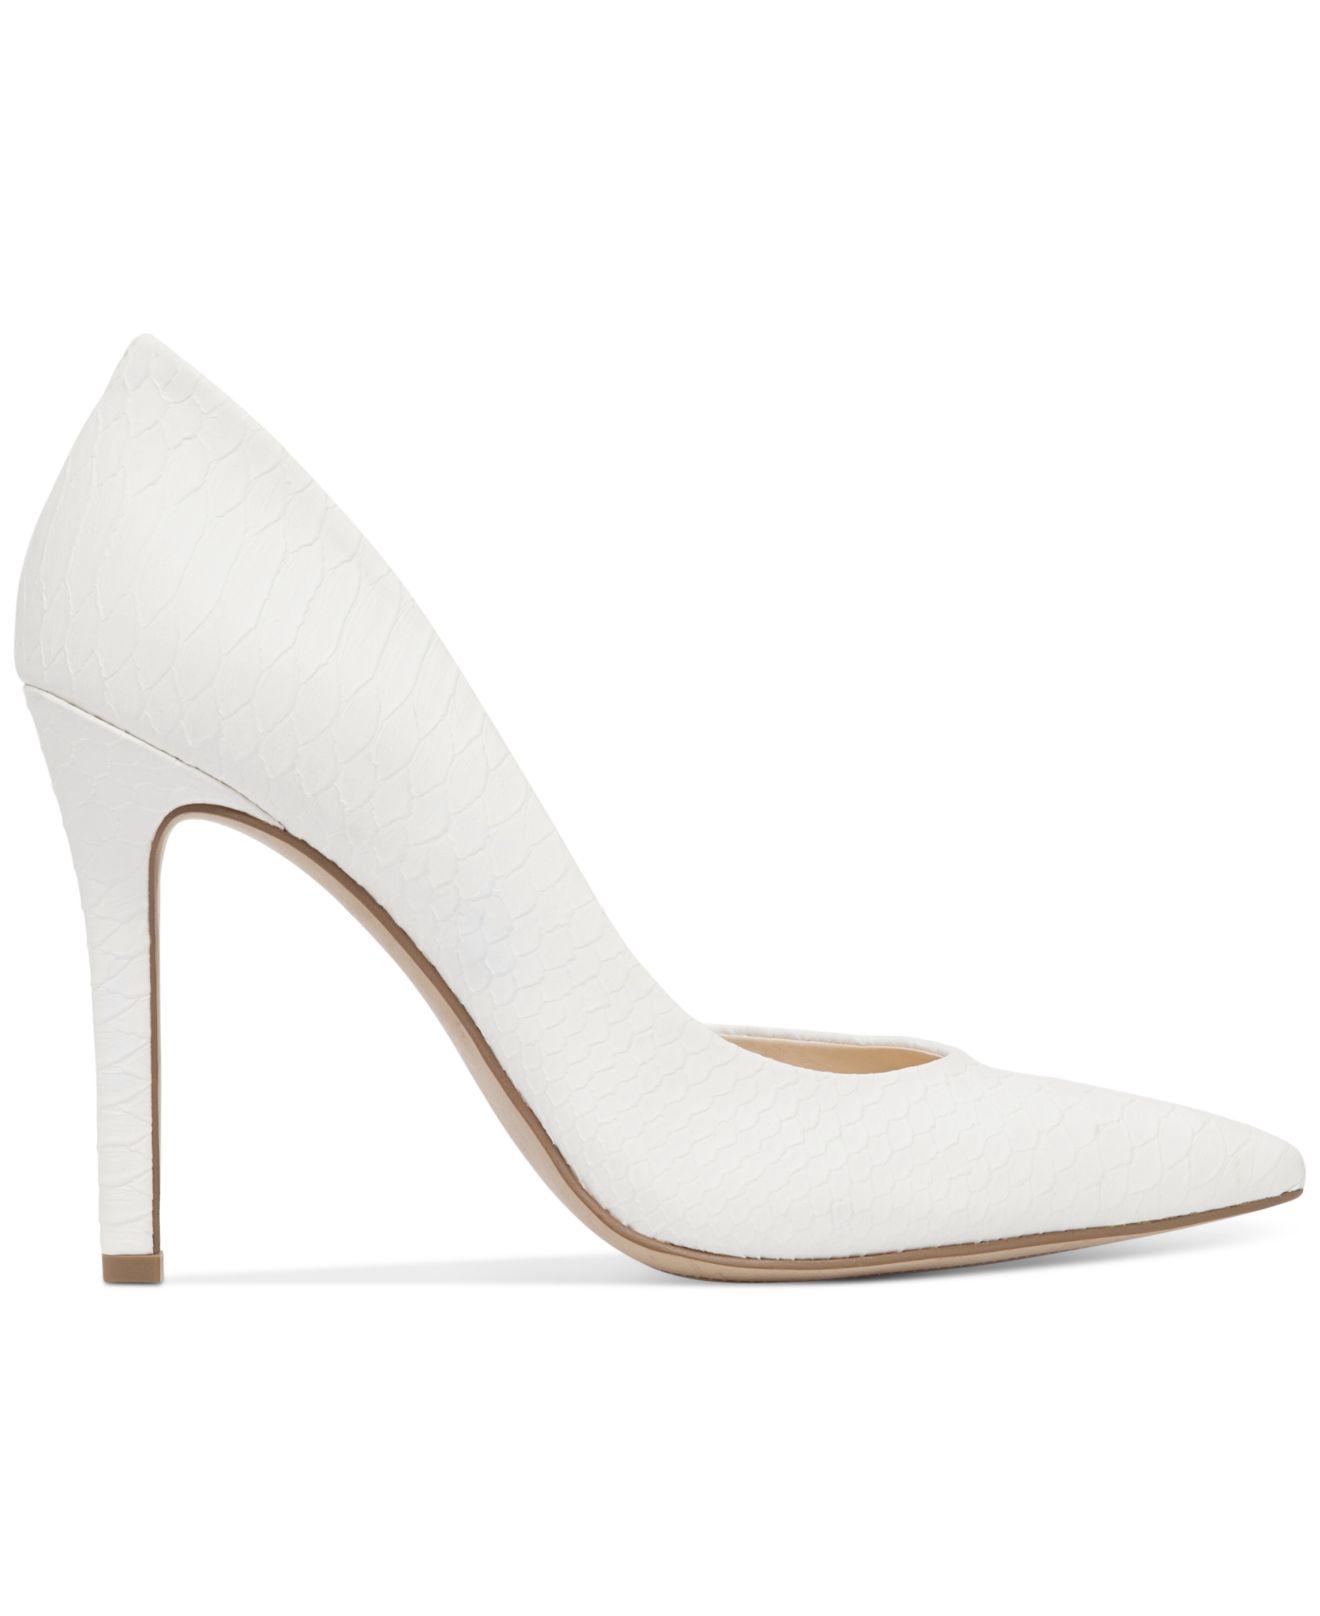 d0f0ca7fbb5 Lyst - Jessica Simpson Claudette D orsay Pumps in White